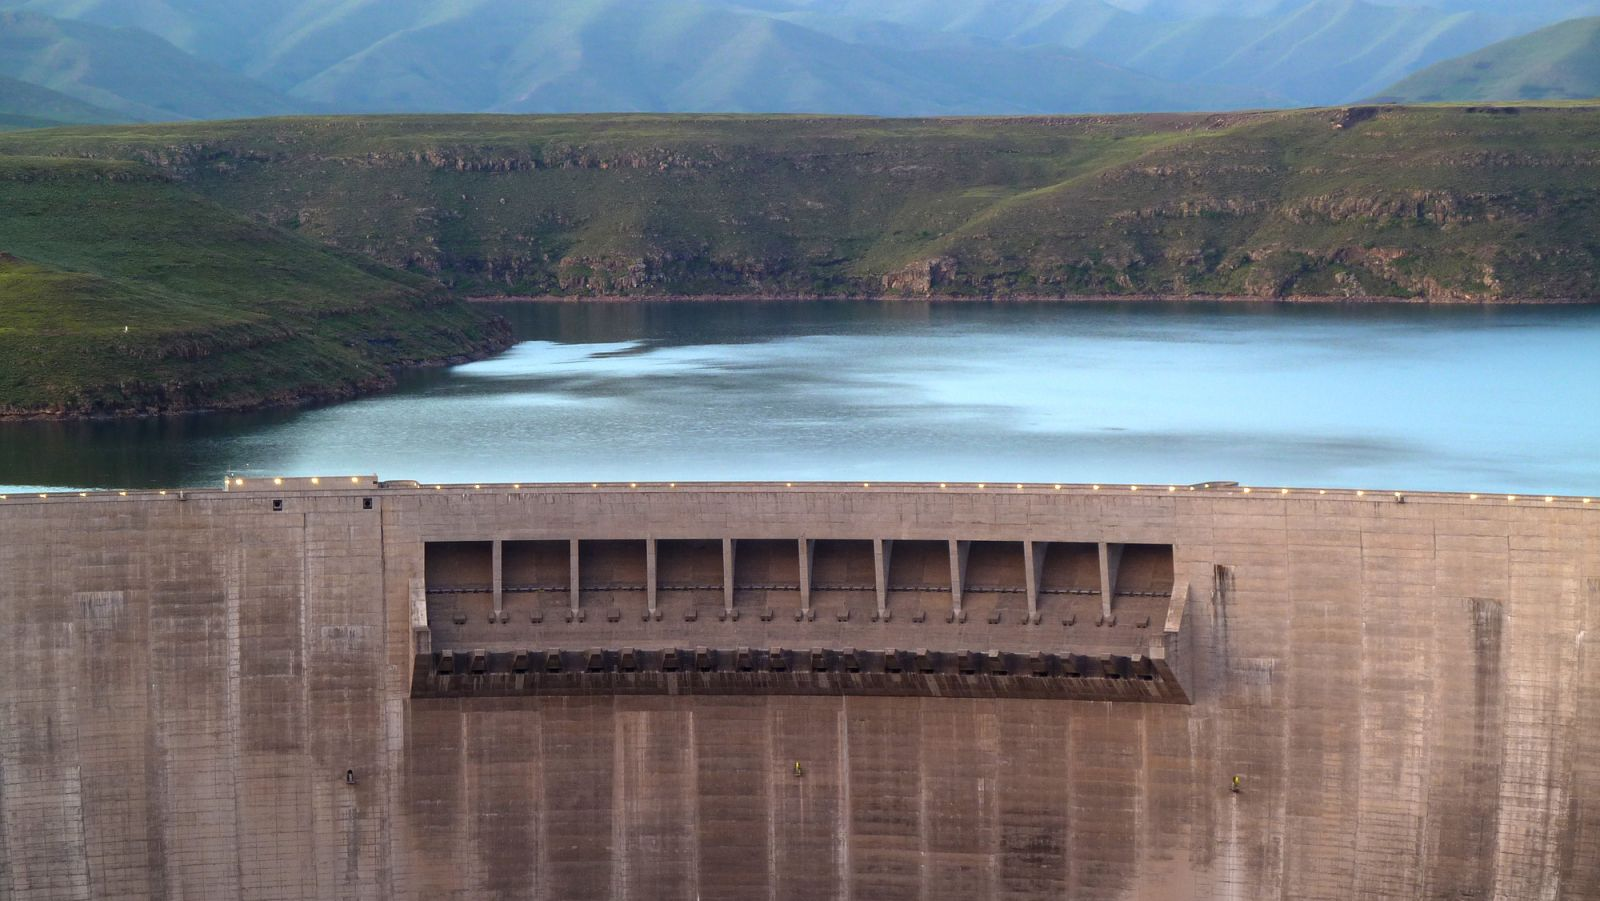 Lesotho 7P8Z DX News